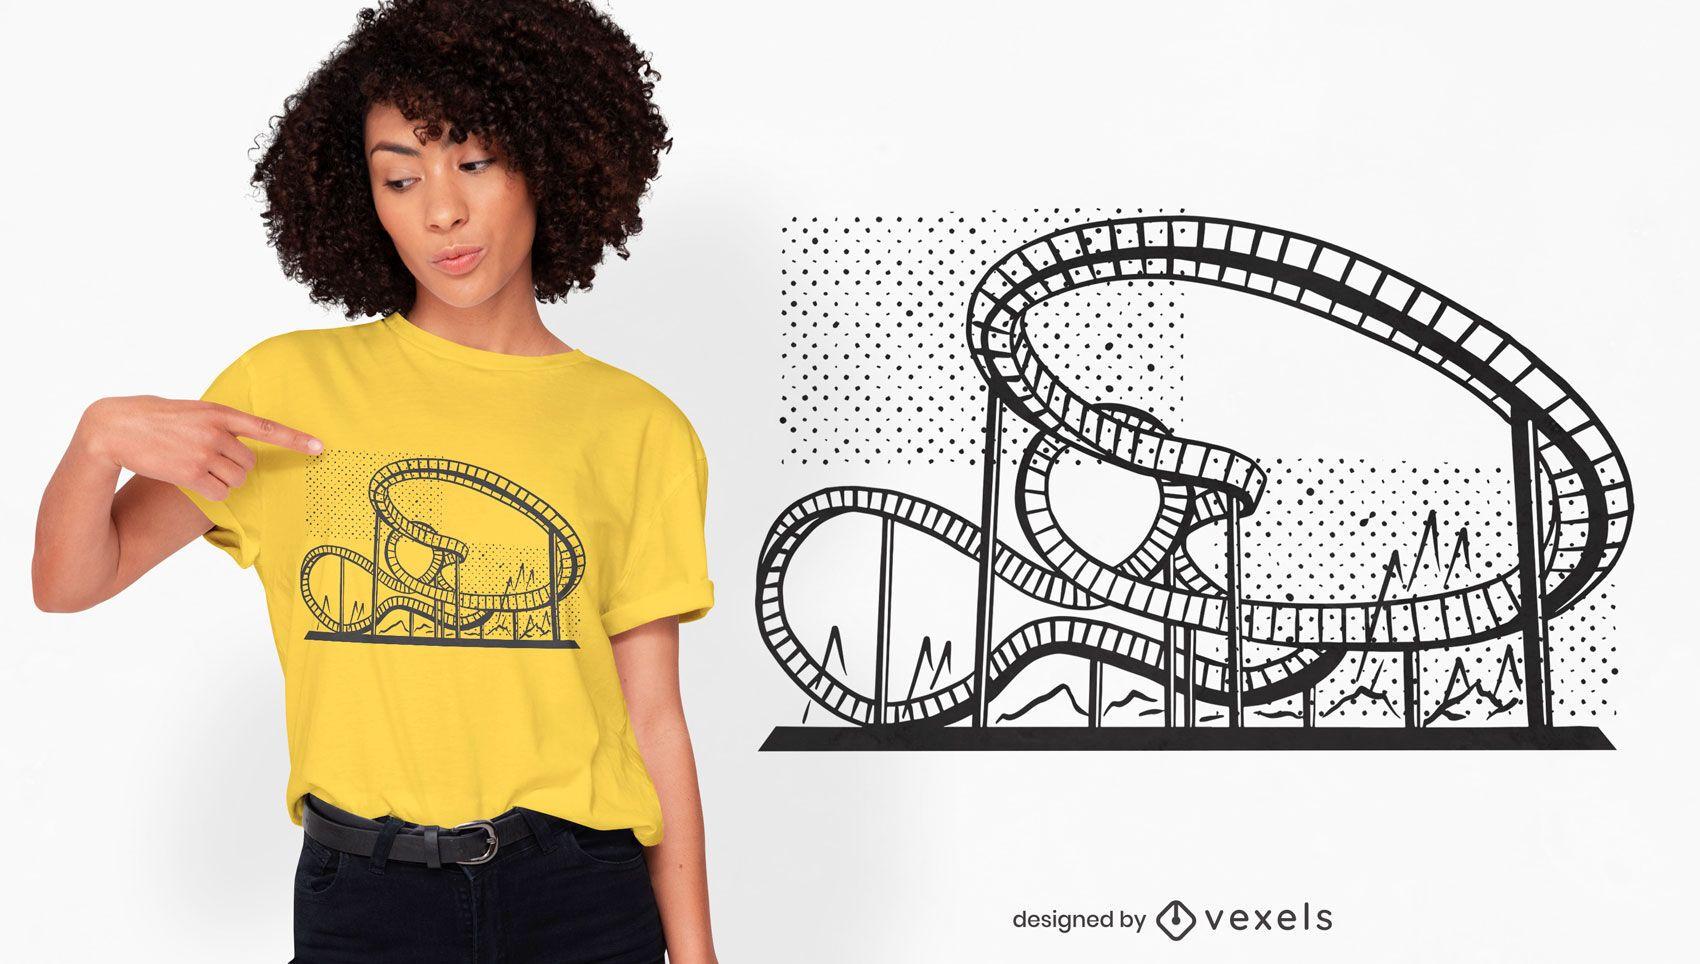 Achterbahn Vergnügungspark T-Shirt Design